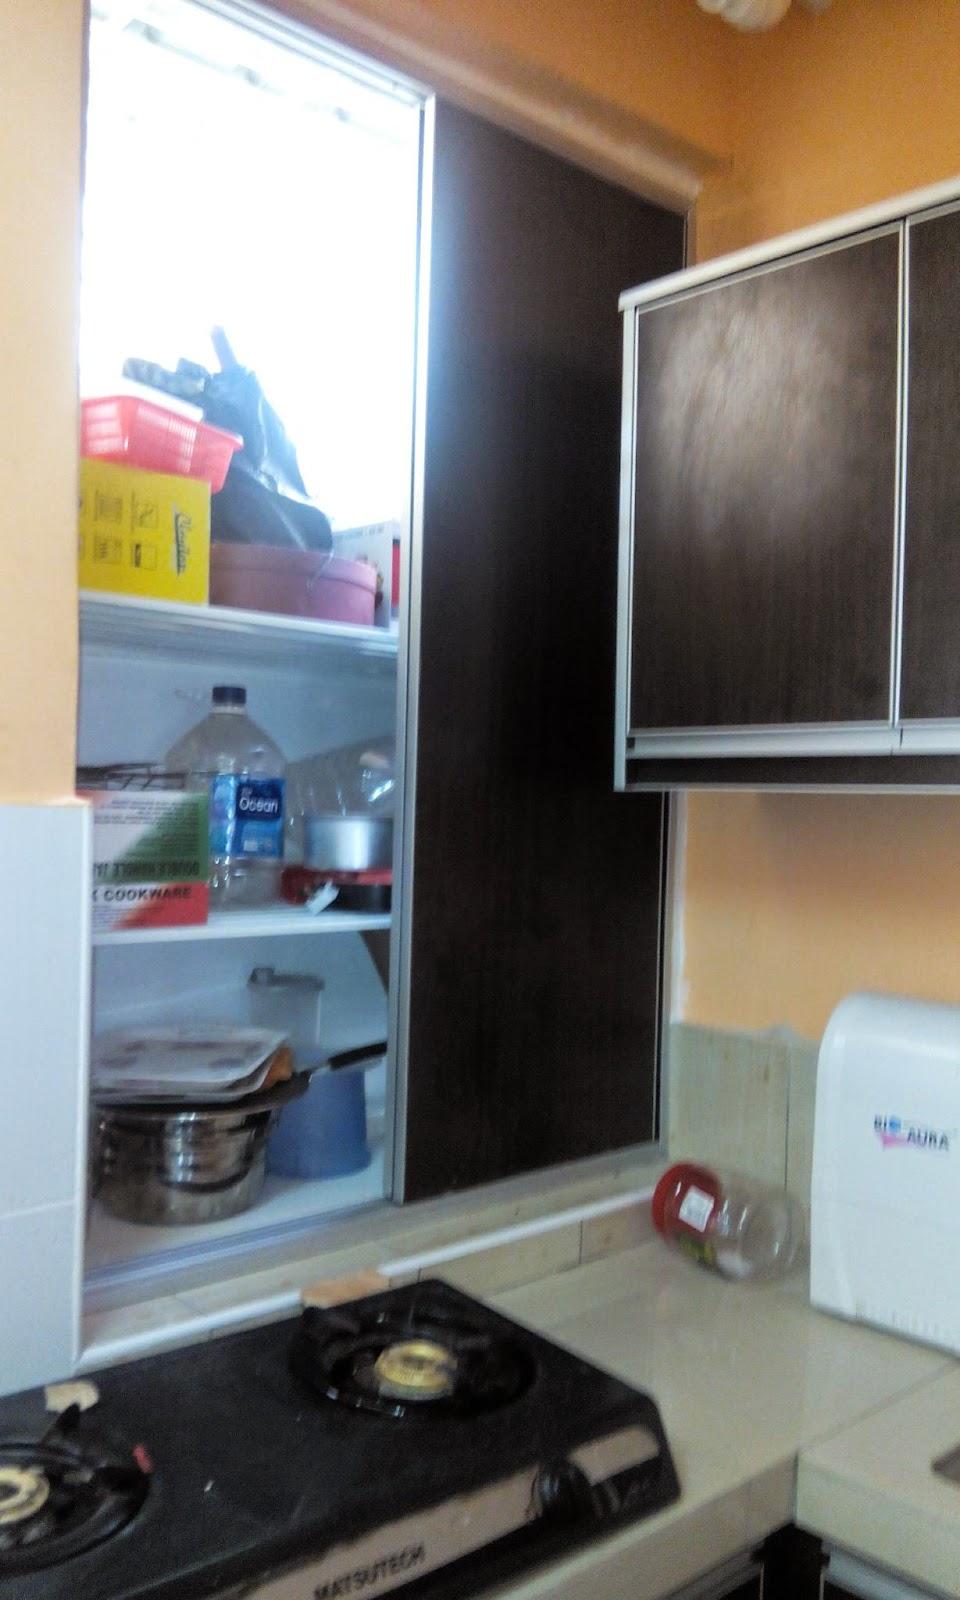 Kabinet Dapur Terus Dari Kilang Kabinet Dapur Guru Silat Gayong